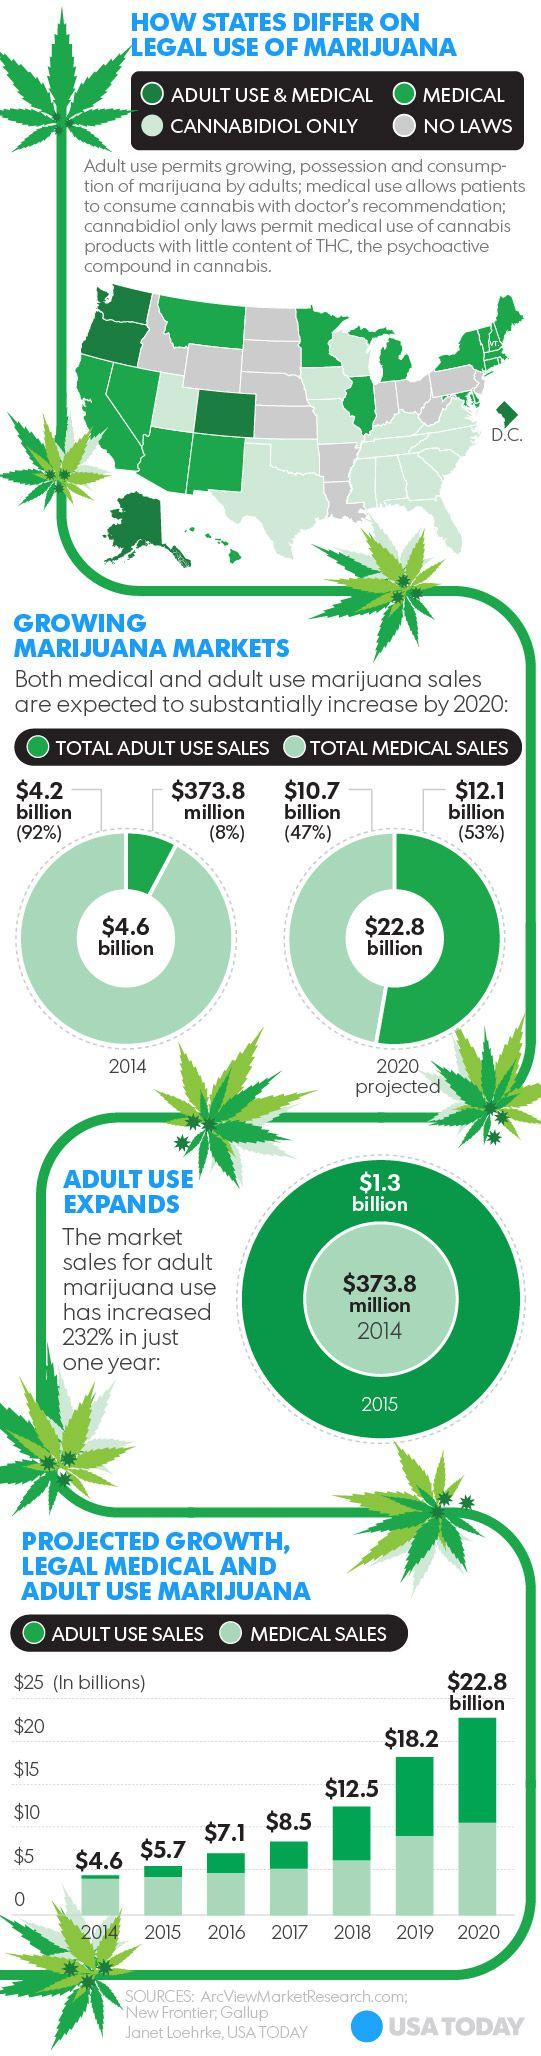 Marijuana is rapidly becoming a big, semi-legal business across the U.S.